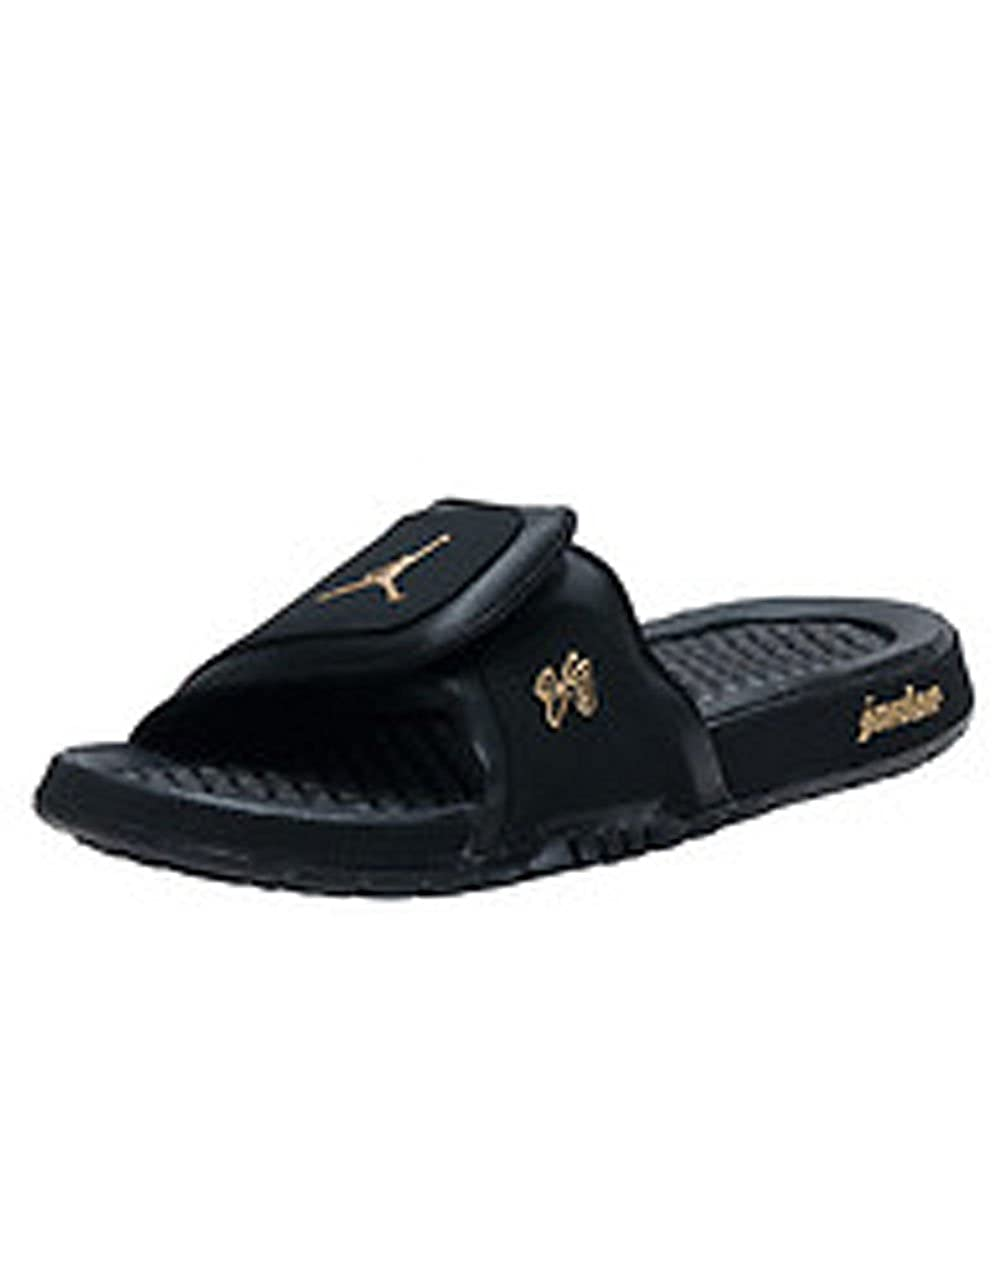 eaeb22034bef Jordan Hydro 2 Premier Men s Slide Style  456524-042 (Black Metallic Gold)  Size 7  Amazon.co.uk  Shoes   Bags